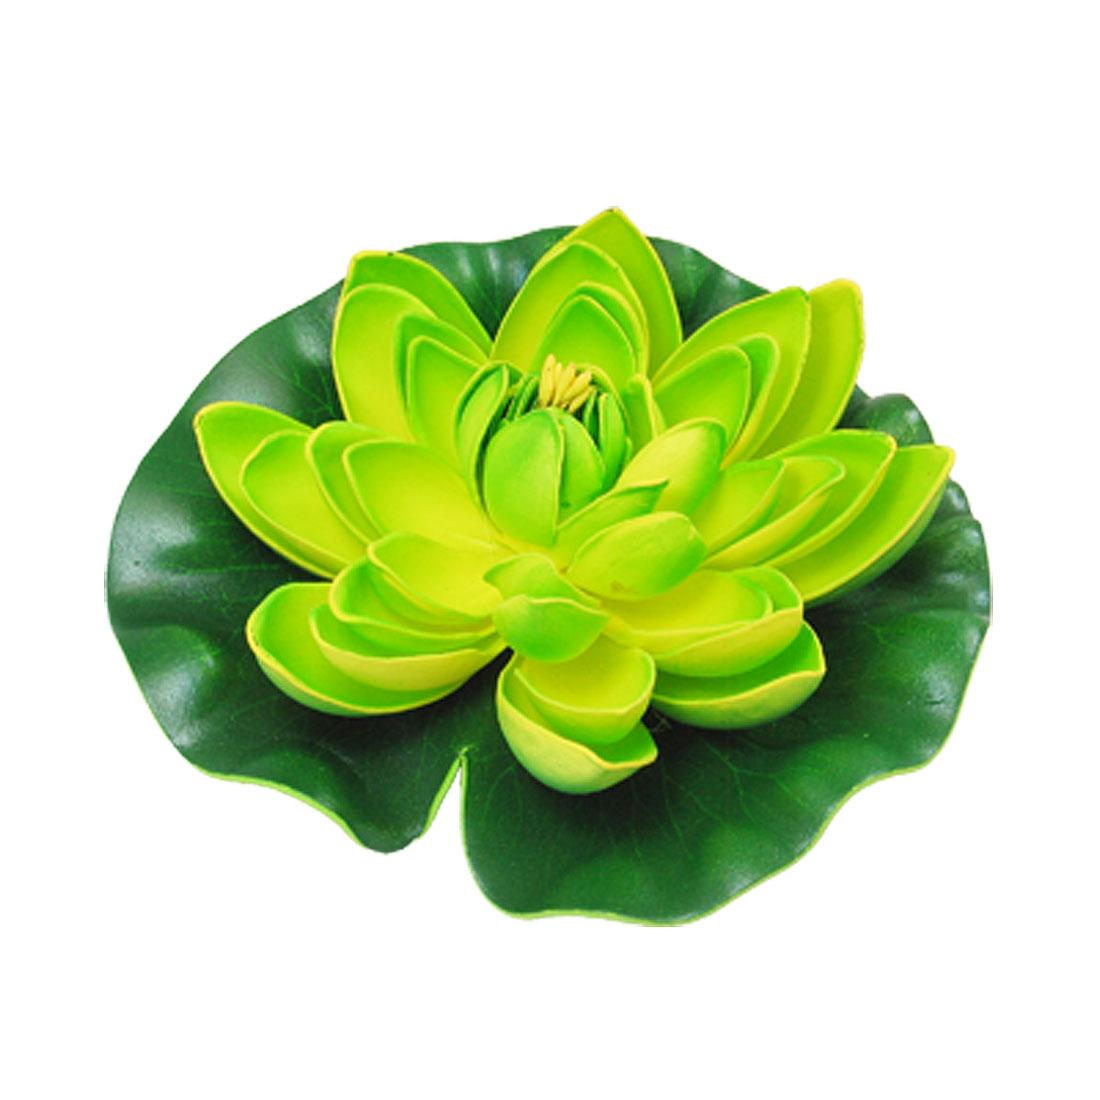 Green Yellow Decoration Floating Lotus for Aquarium Fish Tank